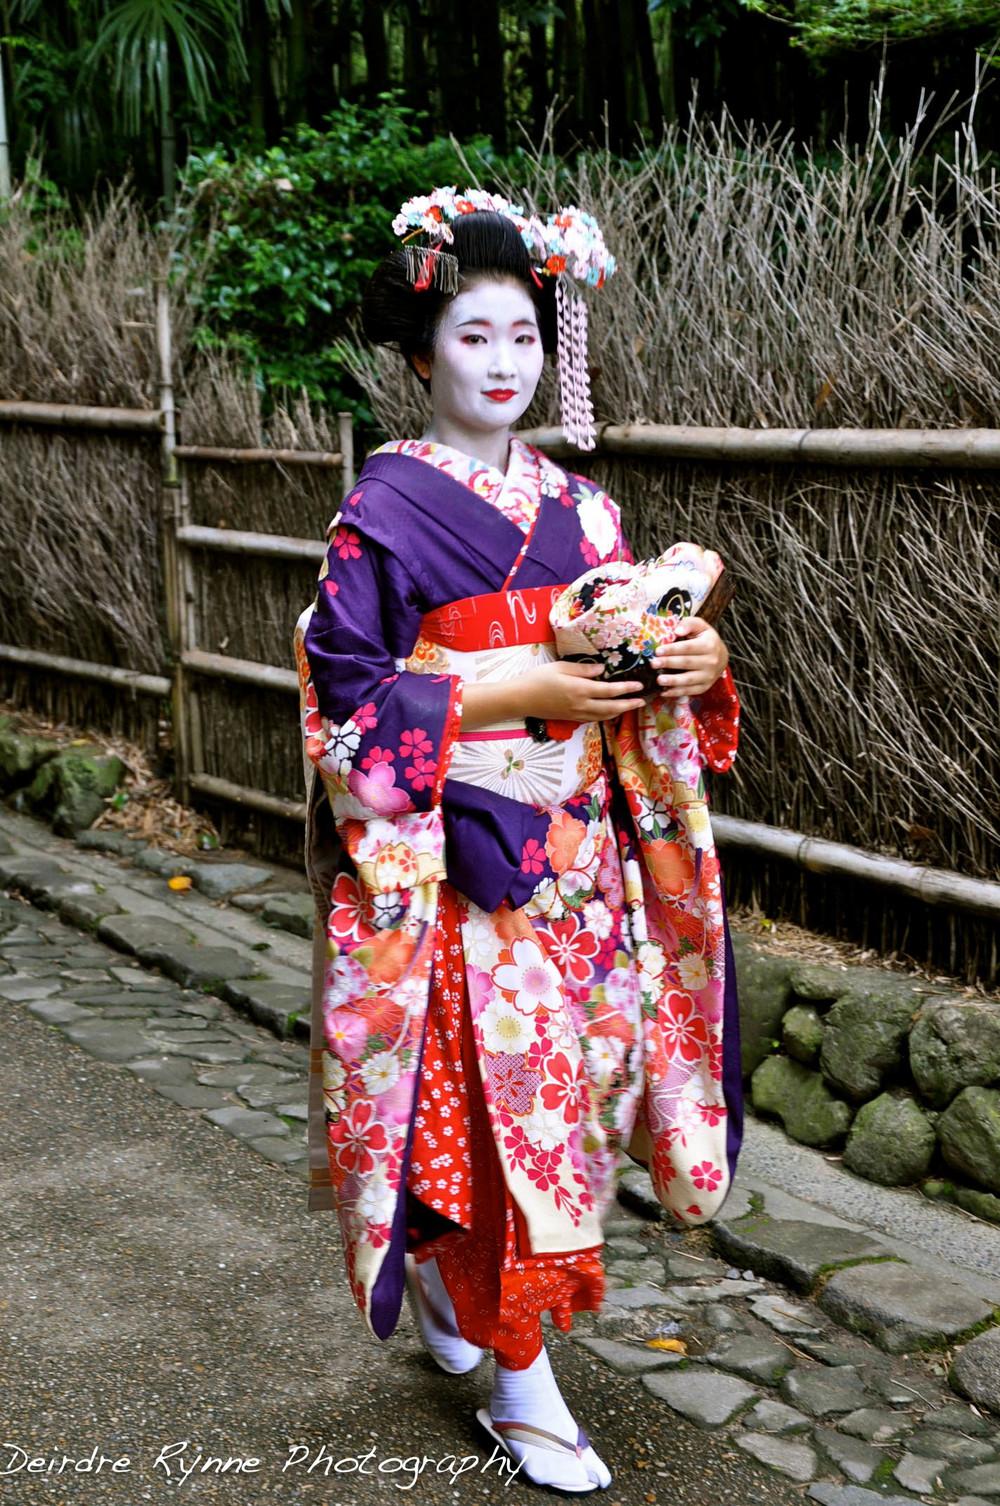 Geisha. Kyoto, Japan. July 2012.